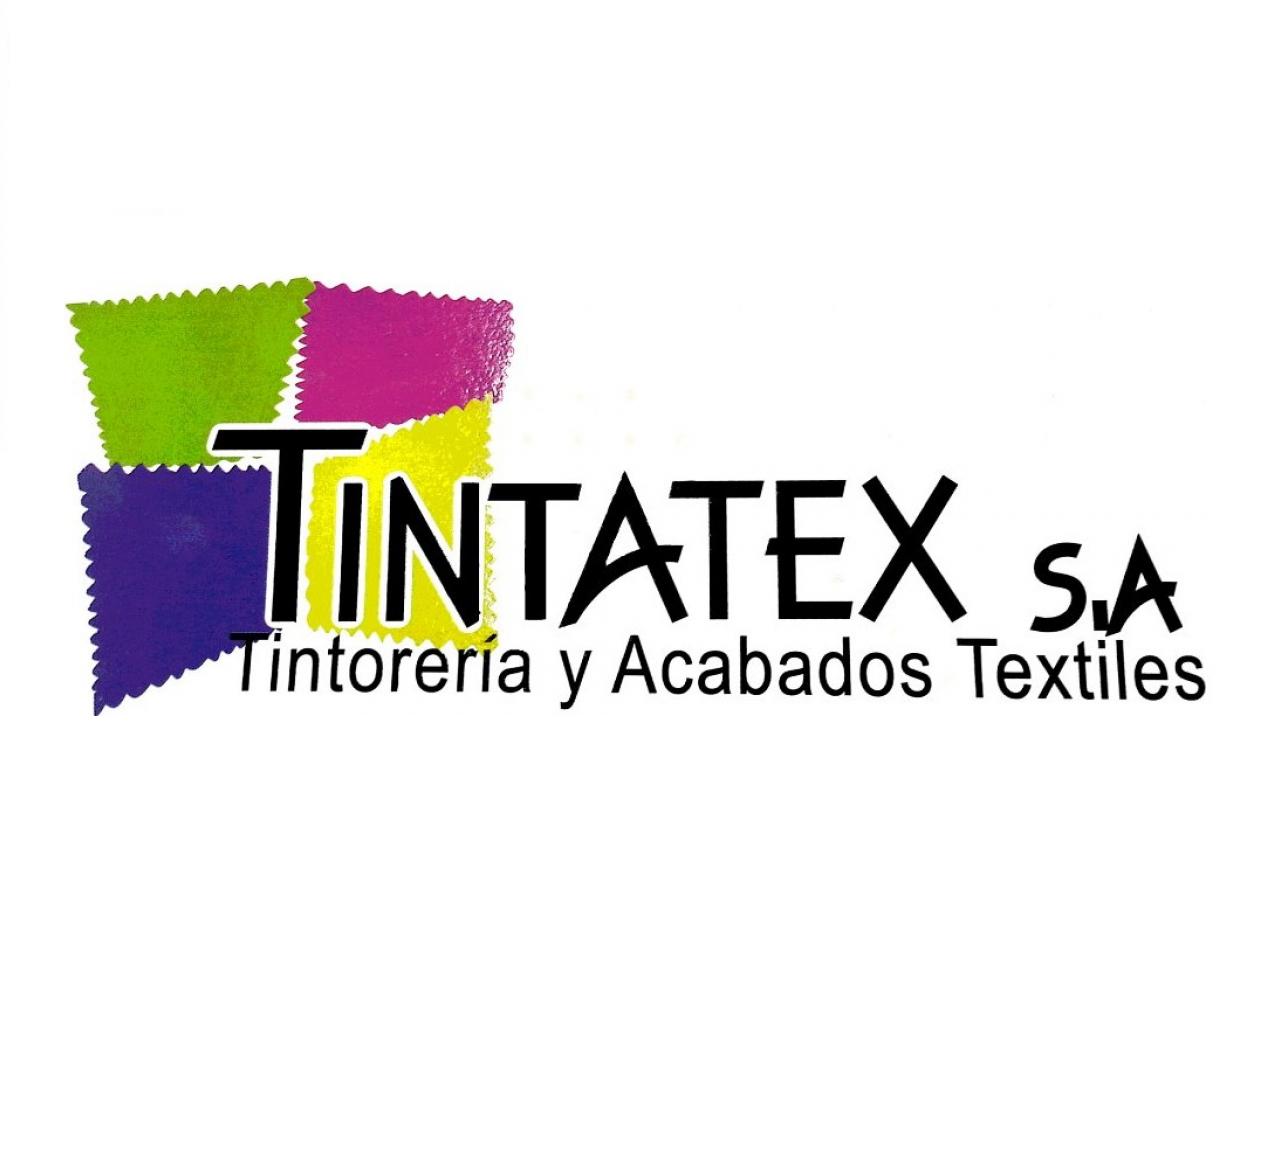 Tintatex S.A